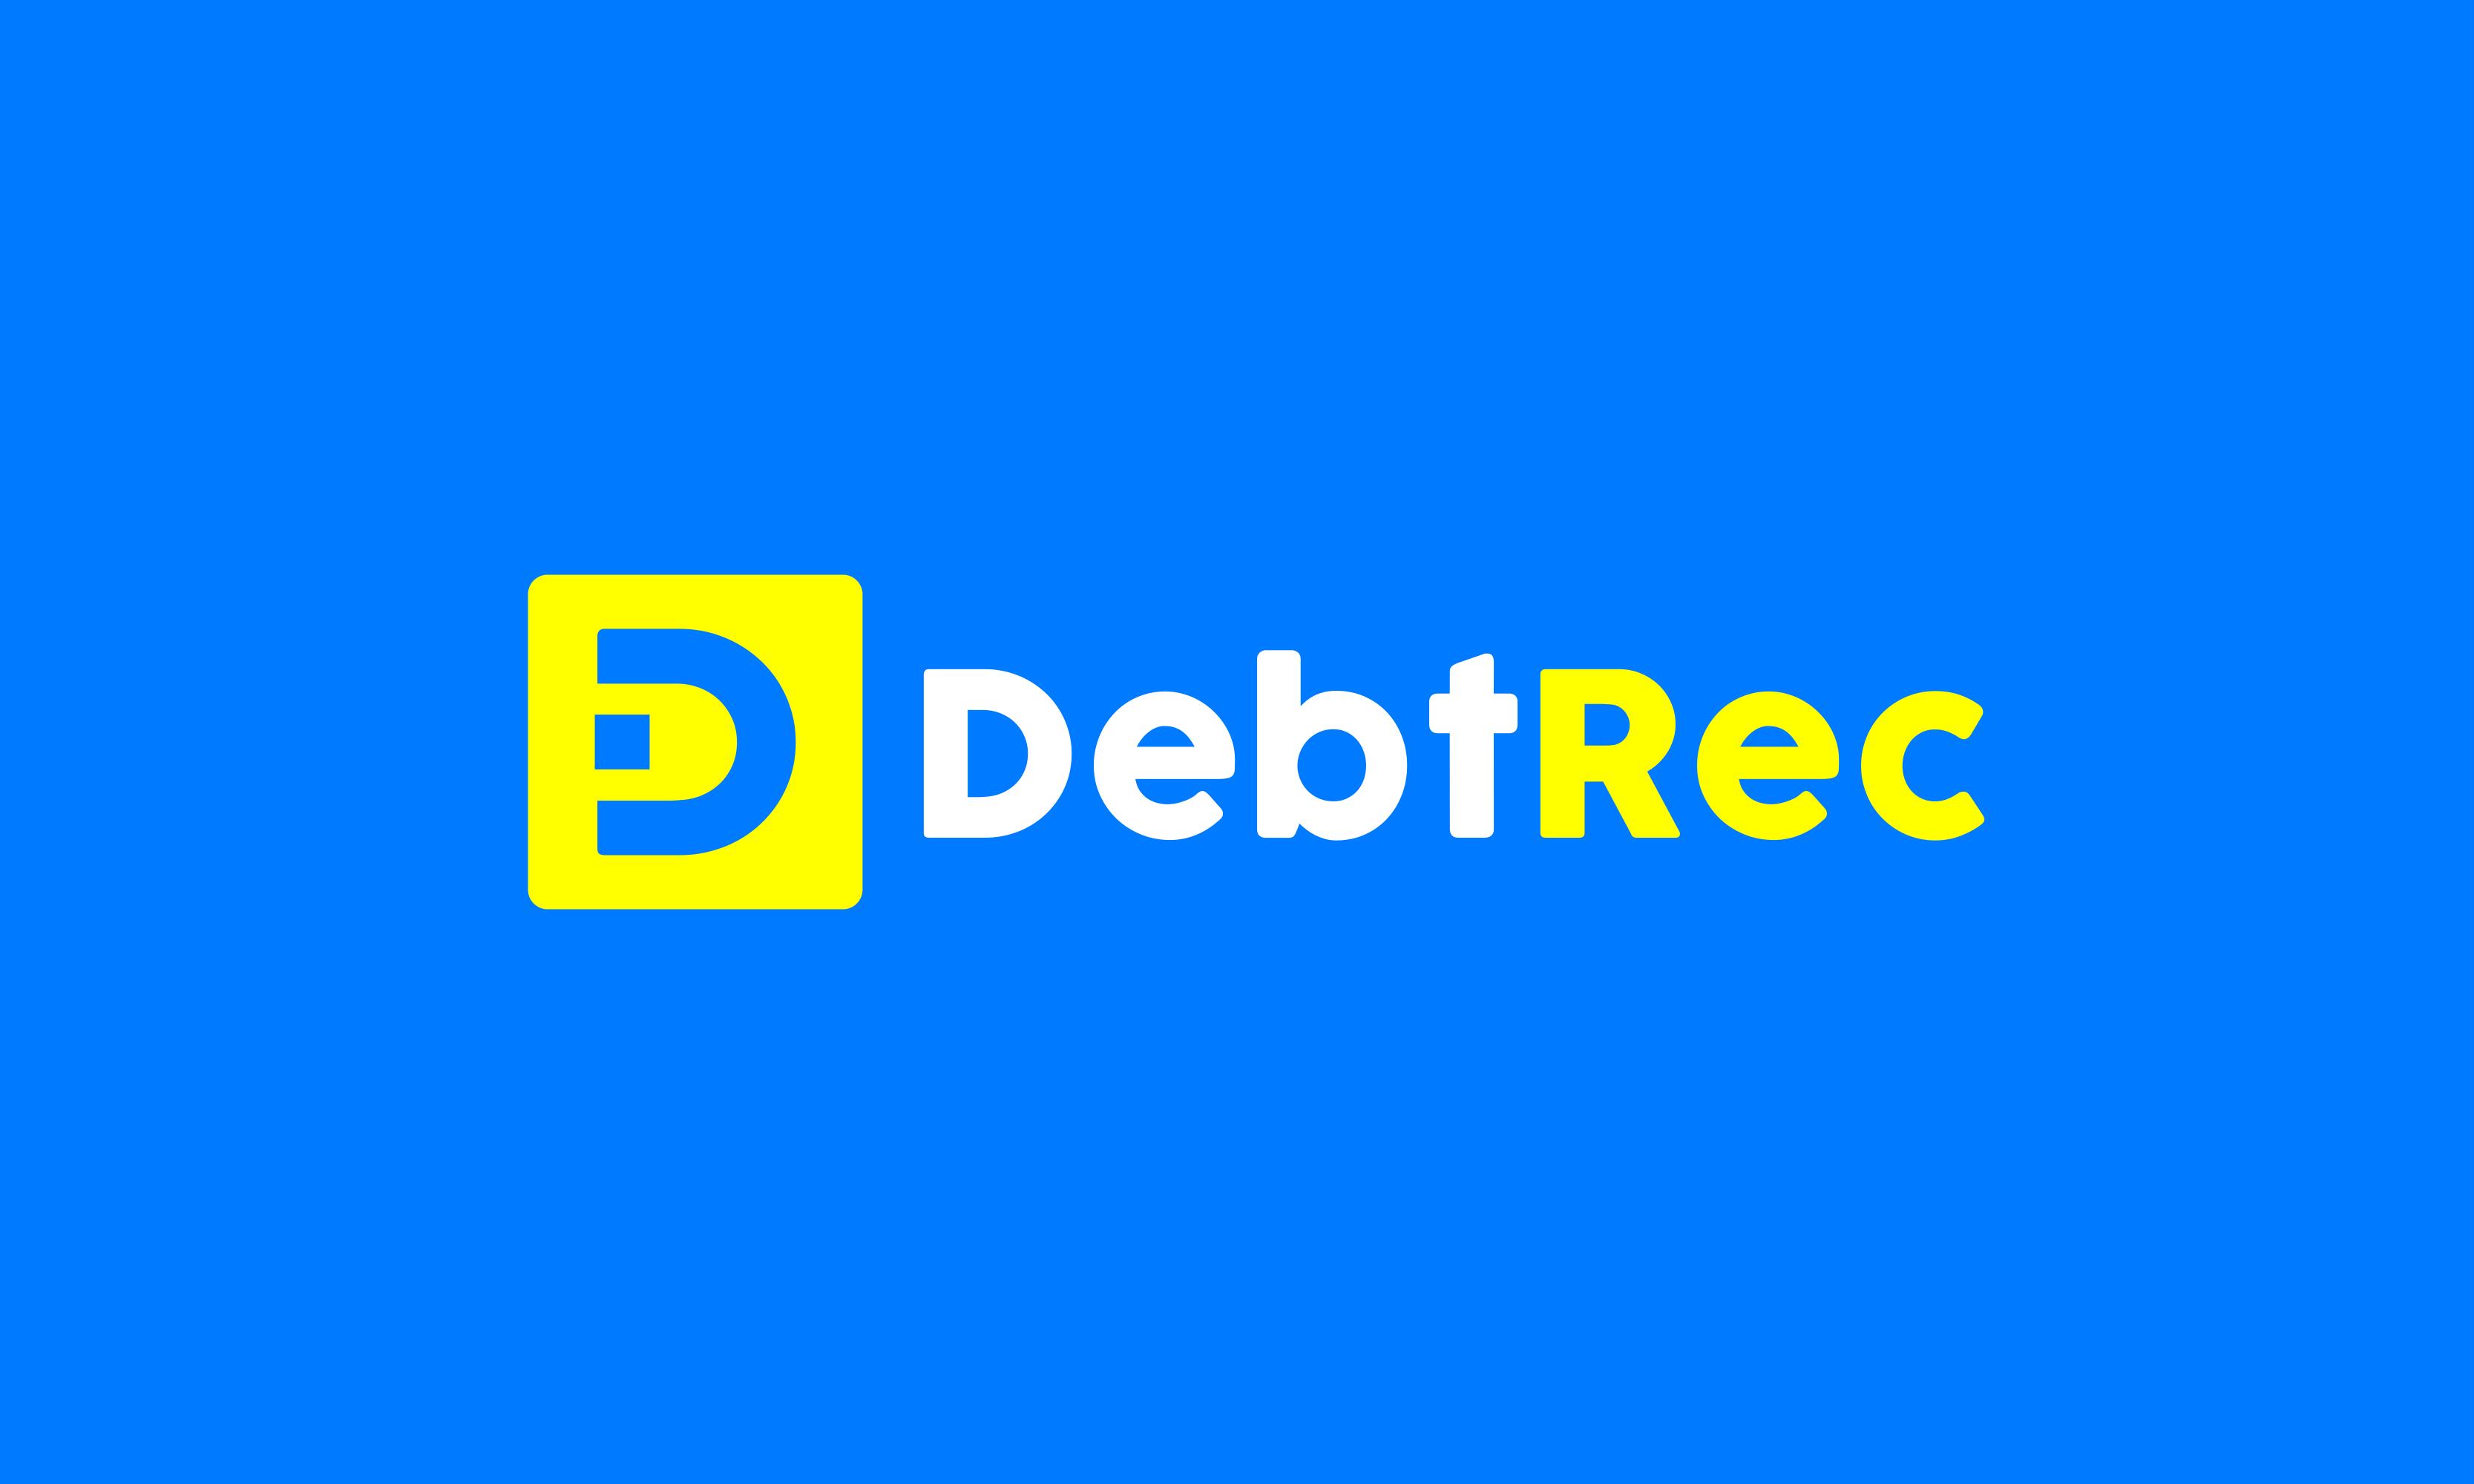 Debtrec